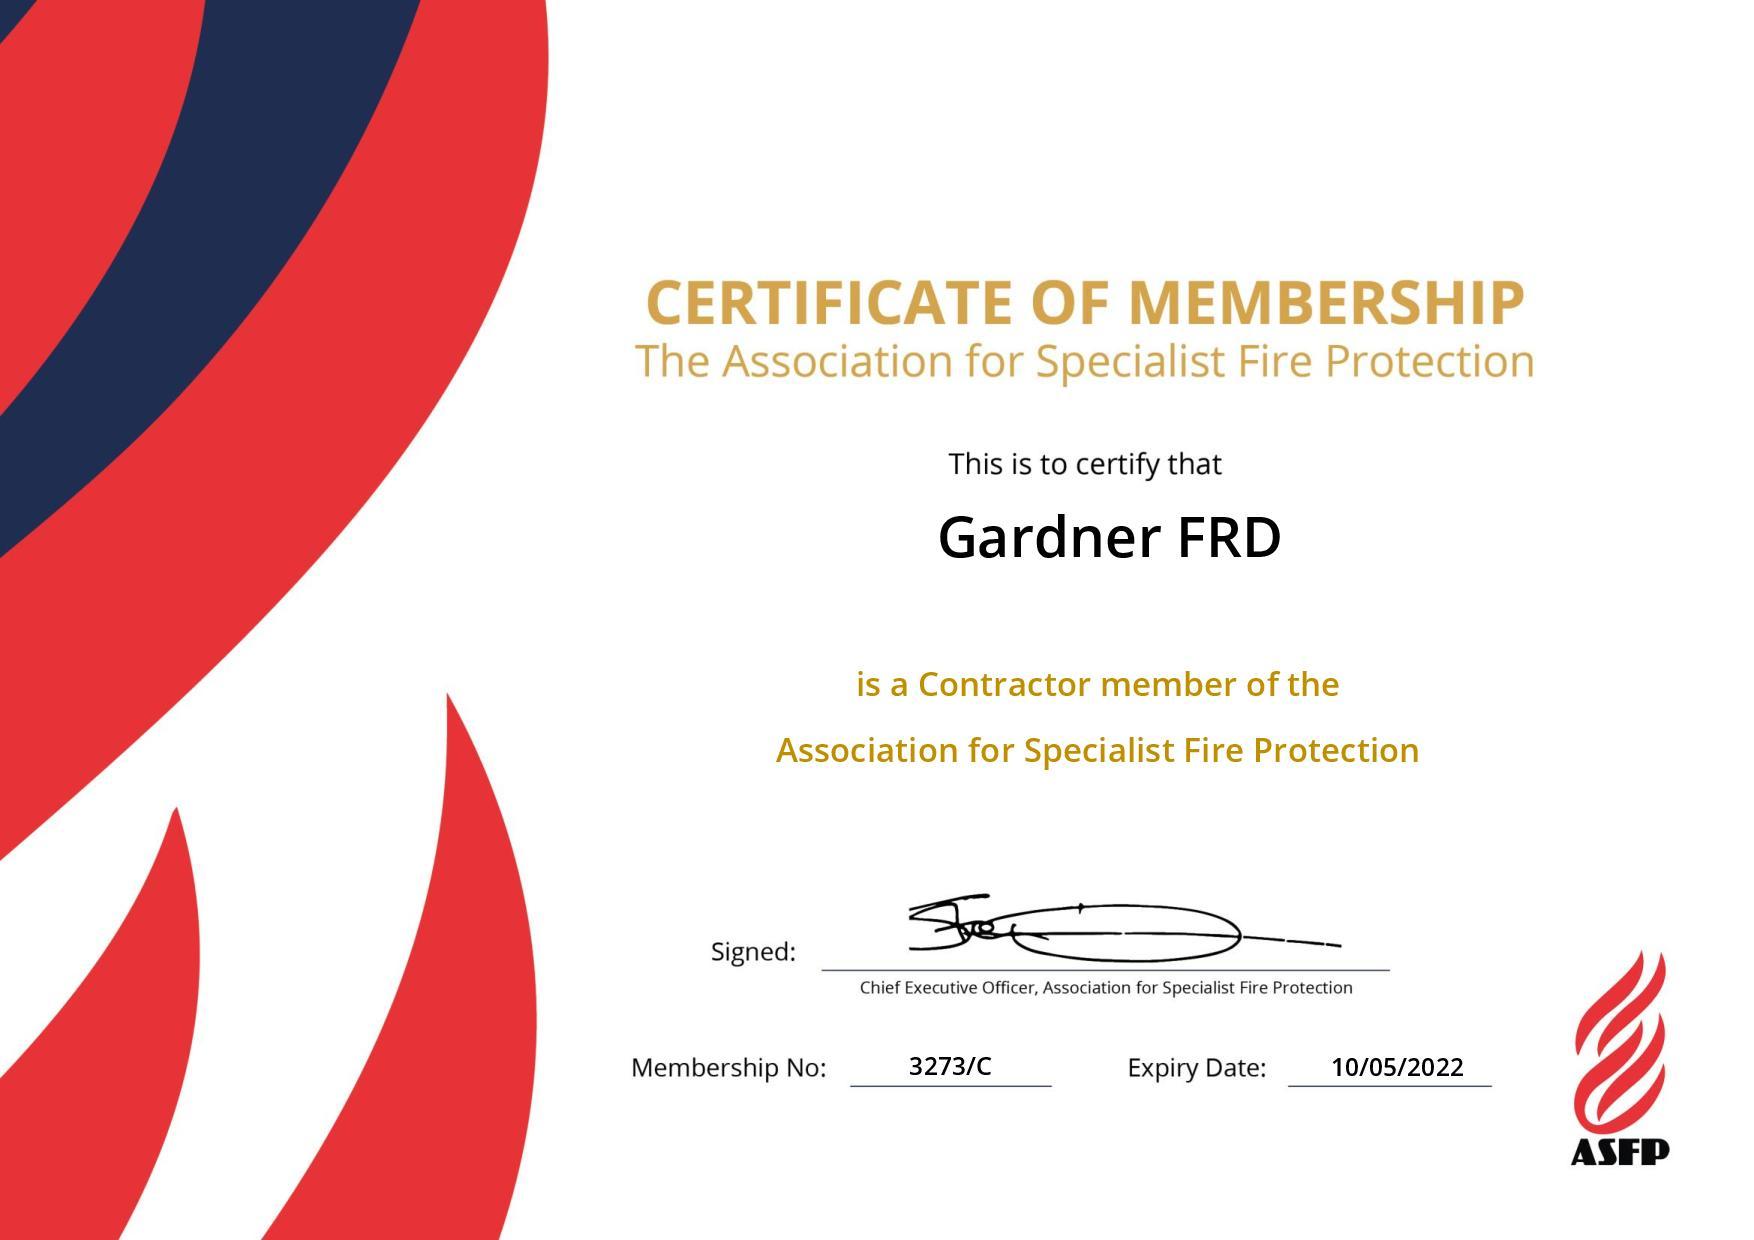 Gardner FRD becomes member of ASFP